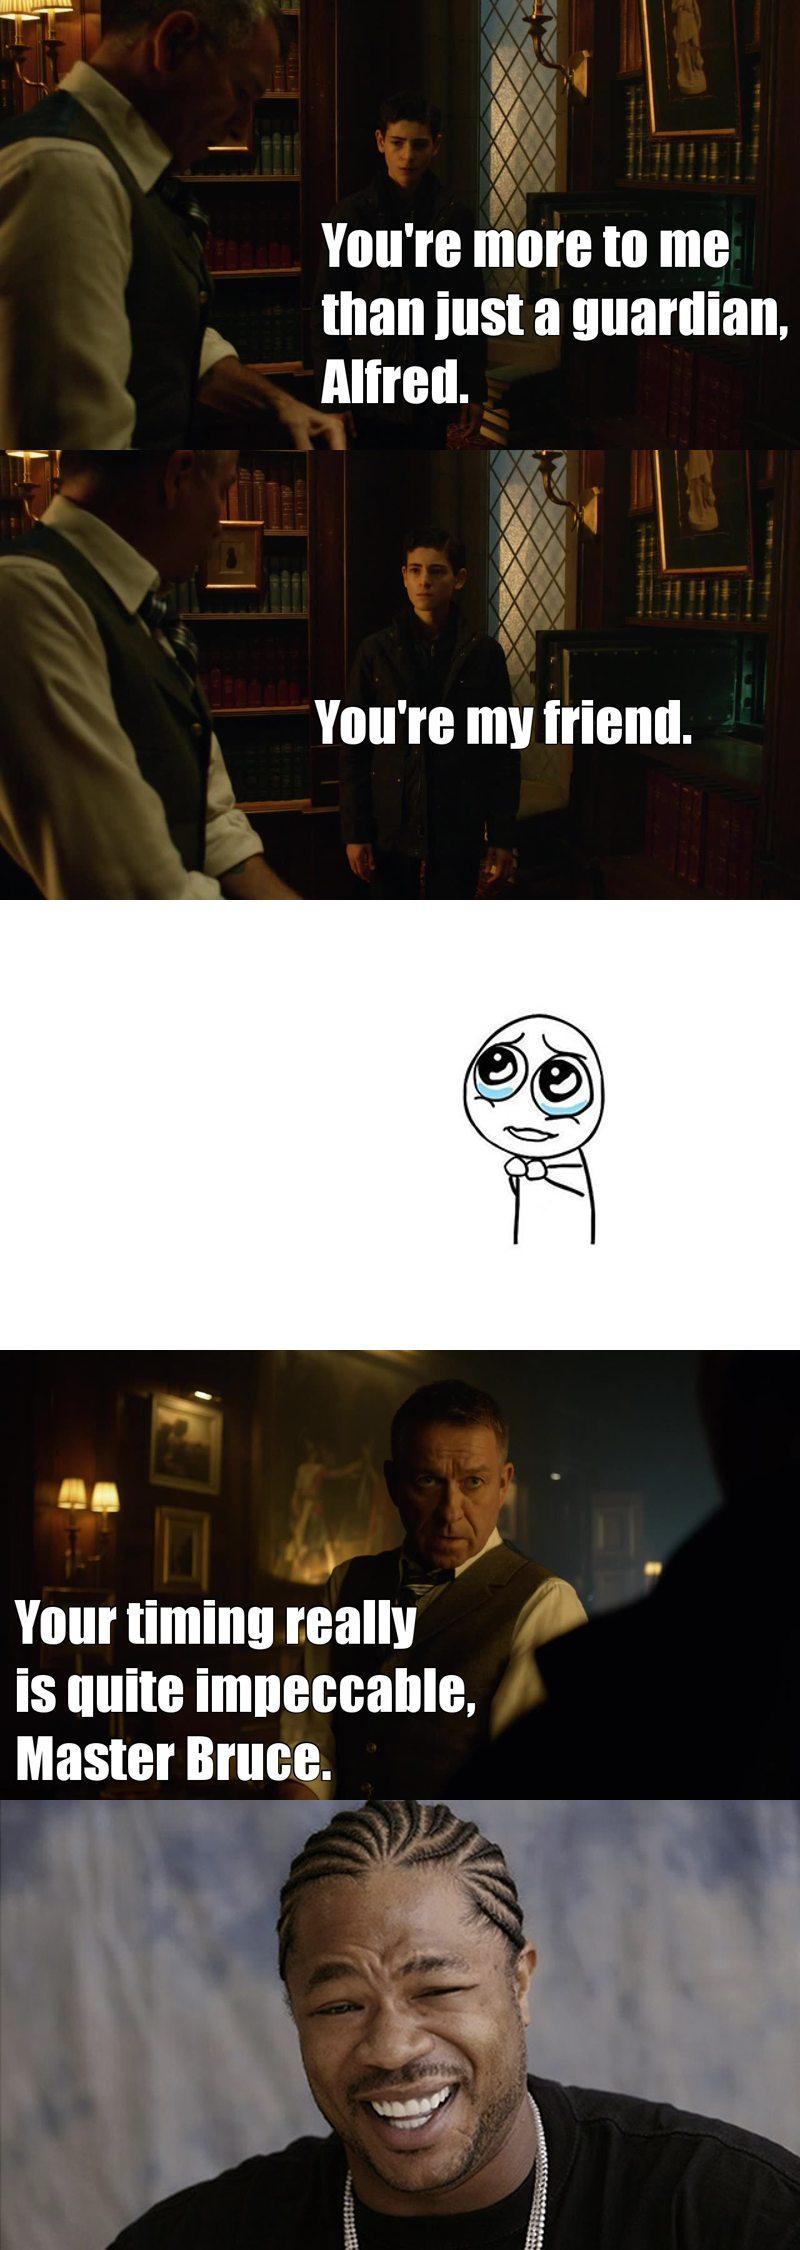 This scene got me😰😔😍😂😅